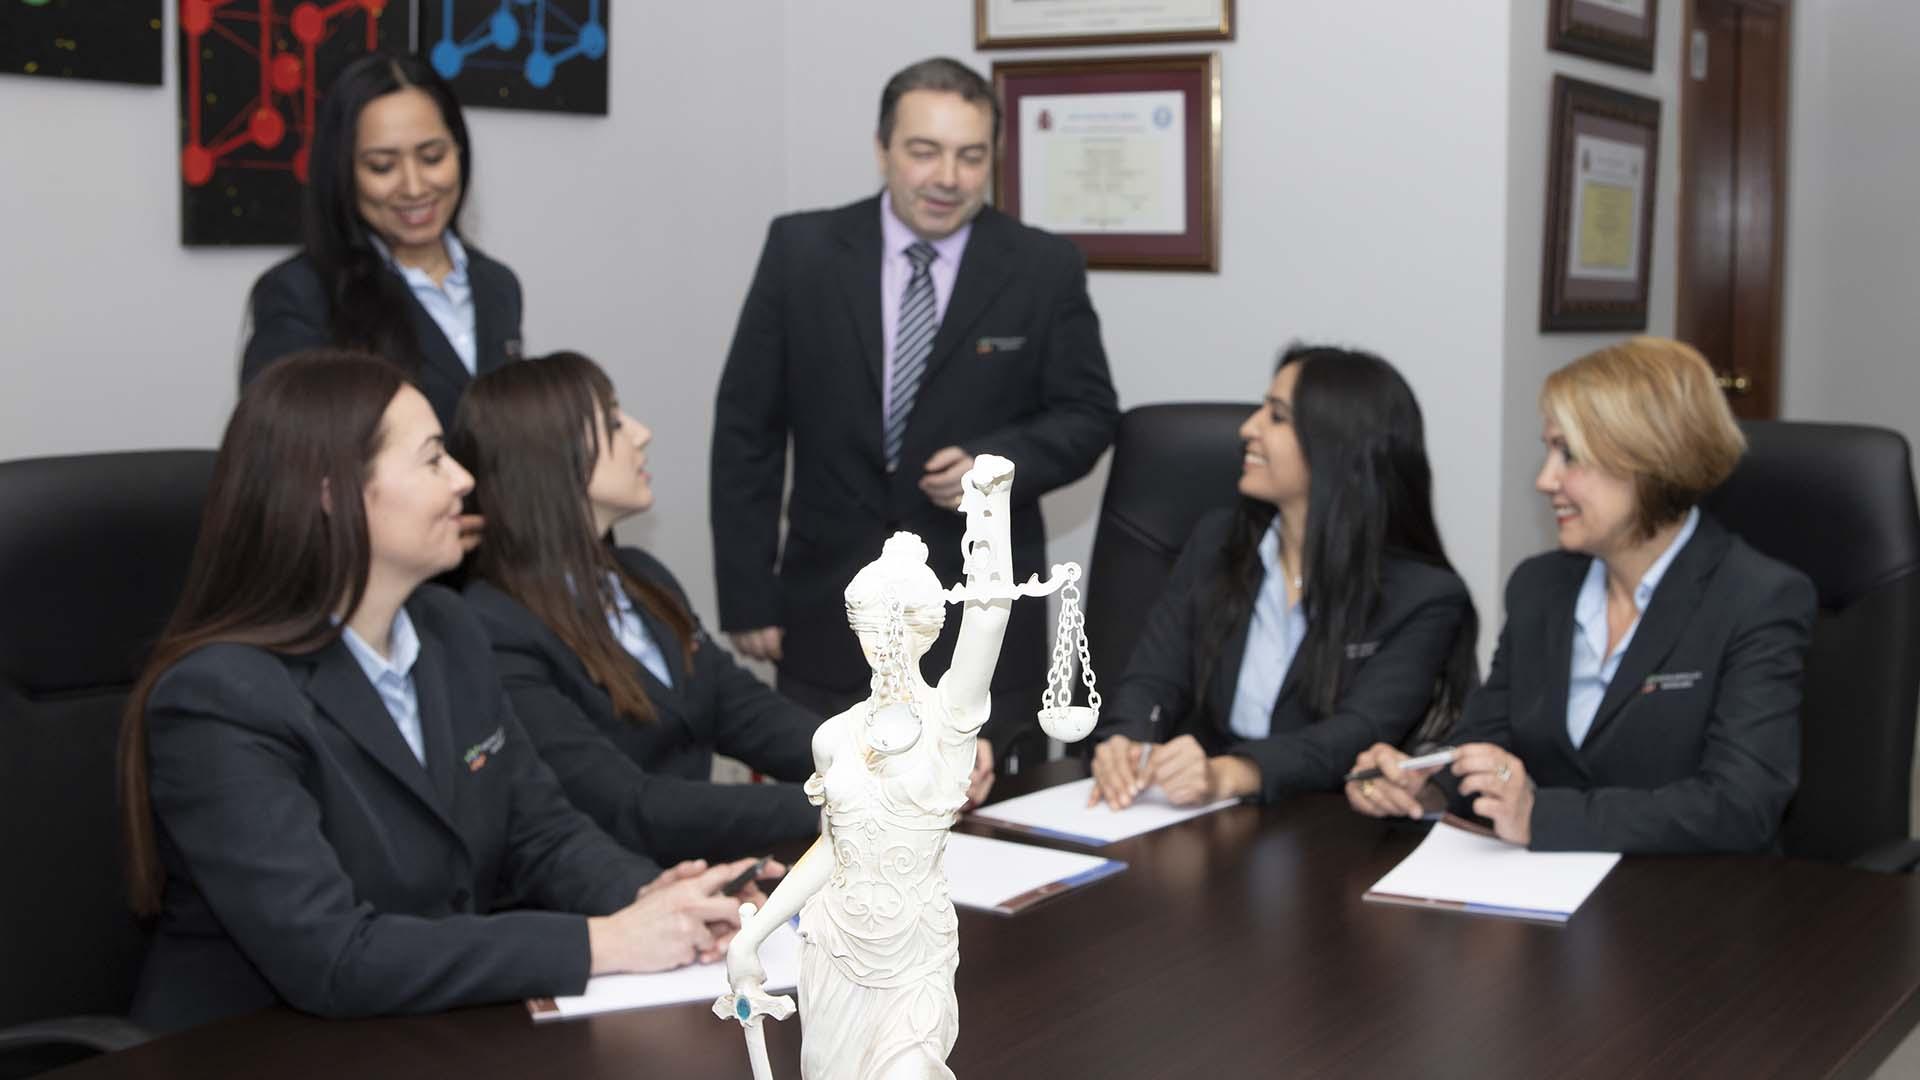 asesoria gestoria abogados autonomos empresas barcelona